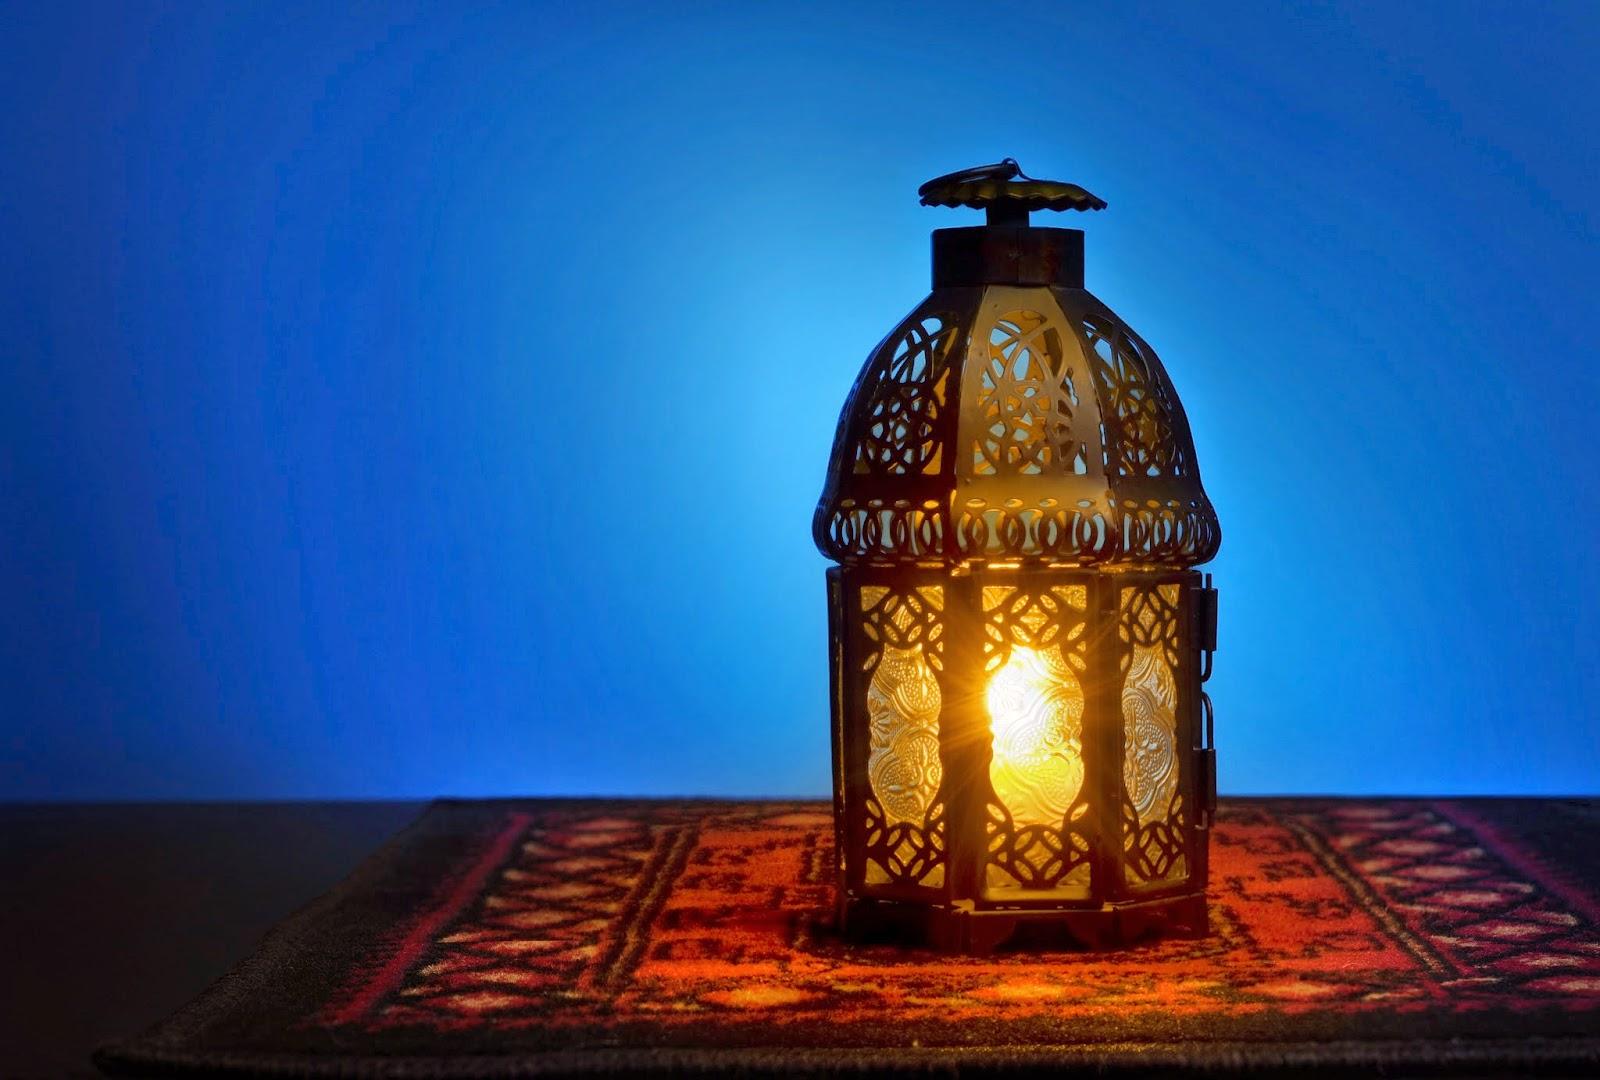 ramazan cover photo